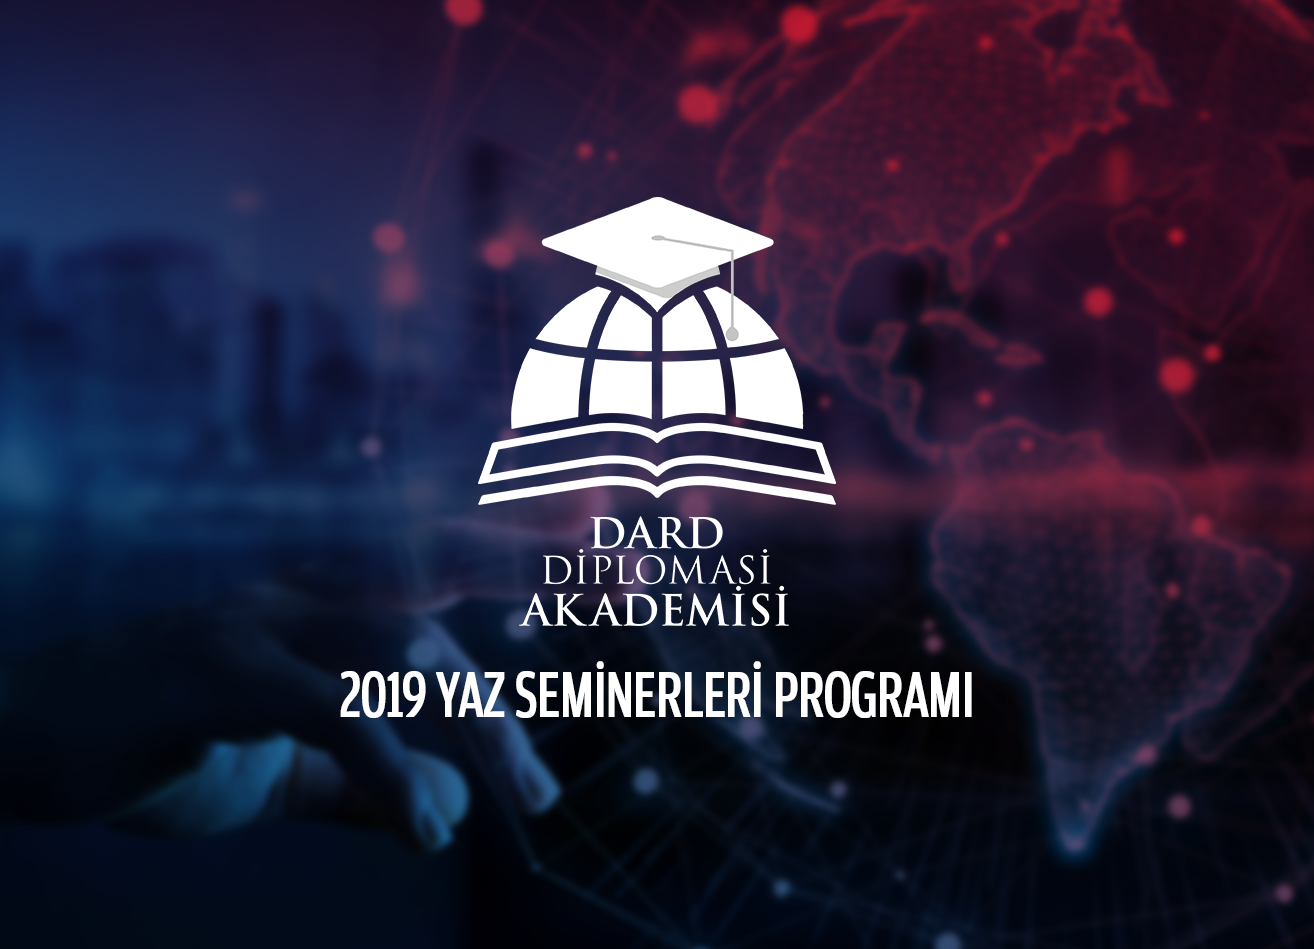 DARD Diplomasi Akademisi 2019 Yaz Seminerleri